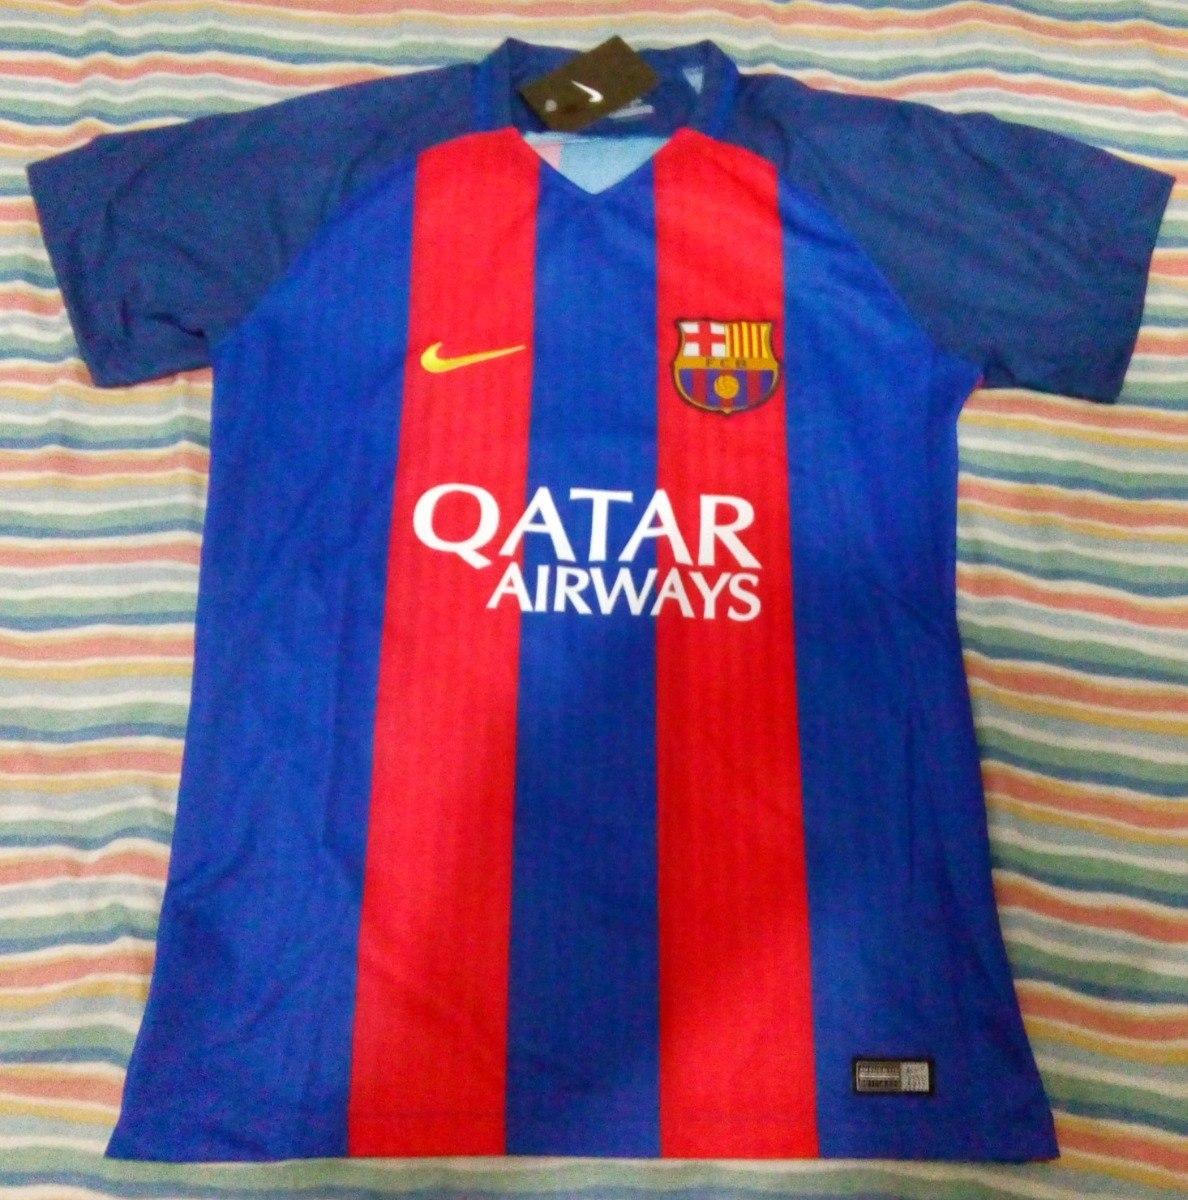 camisa barcelona 2016  17 supporter torcedor. Carregando zoom. 9a67b68a39b0a